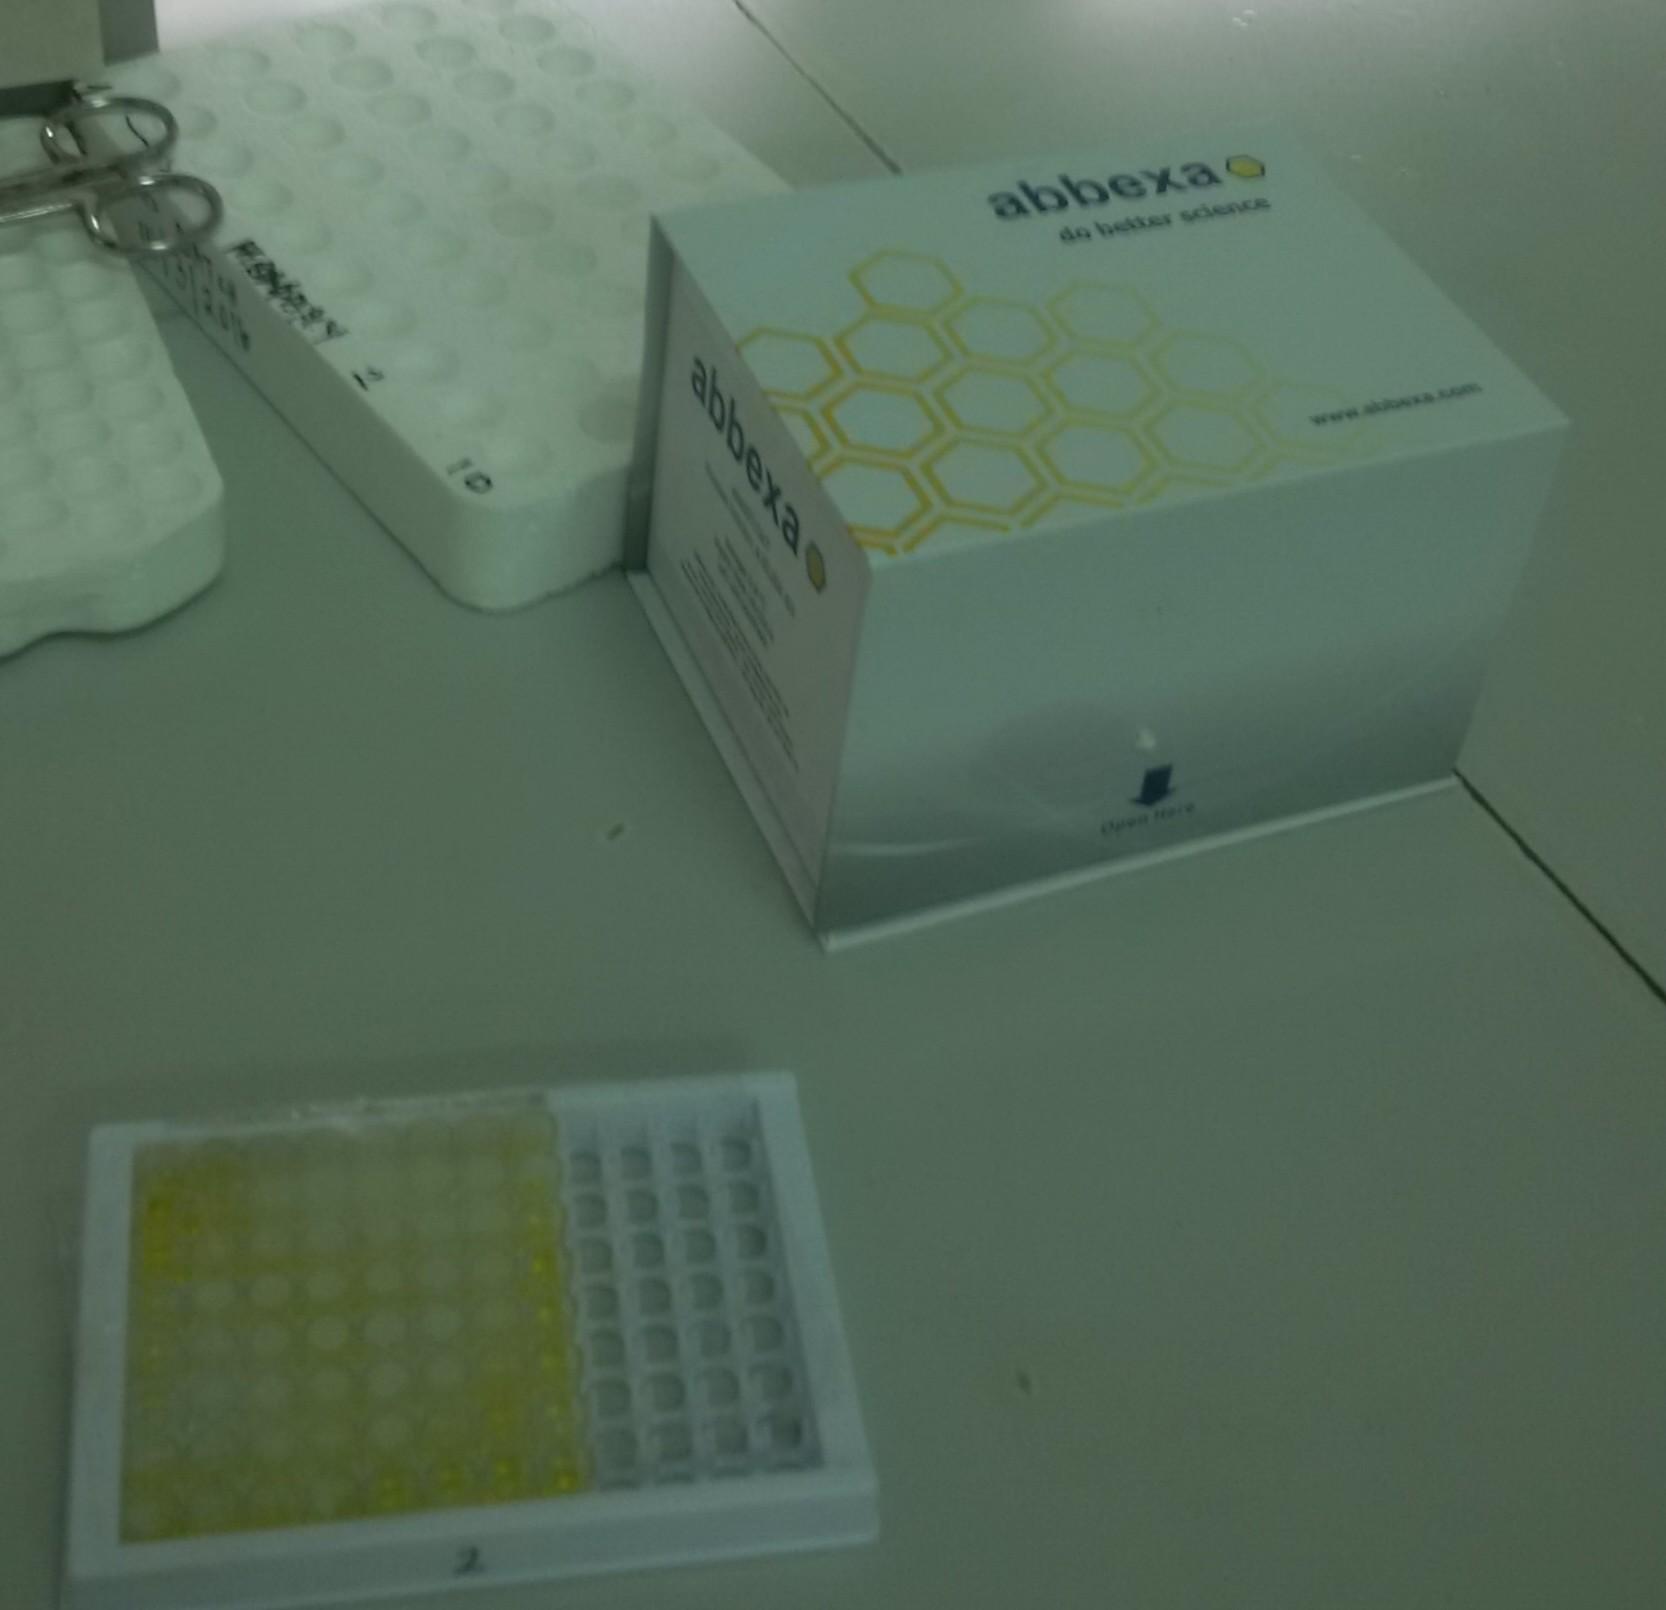 Abbexa's Human Inhibin A ELISA Kit